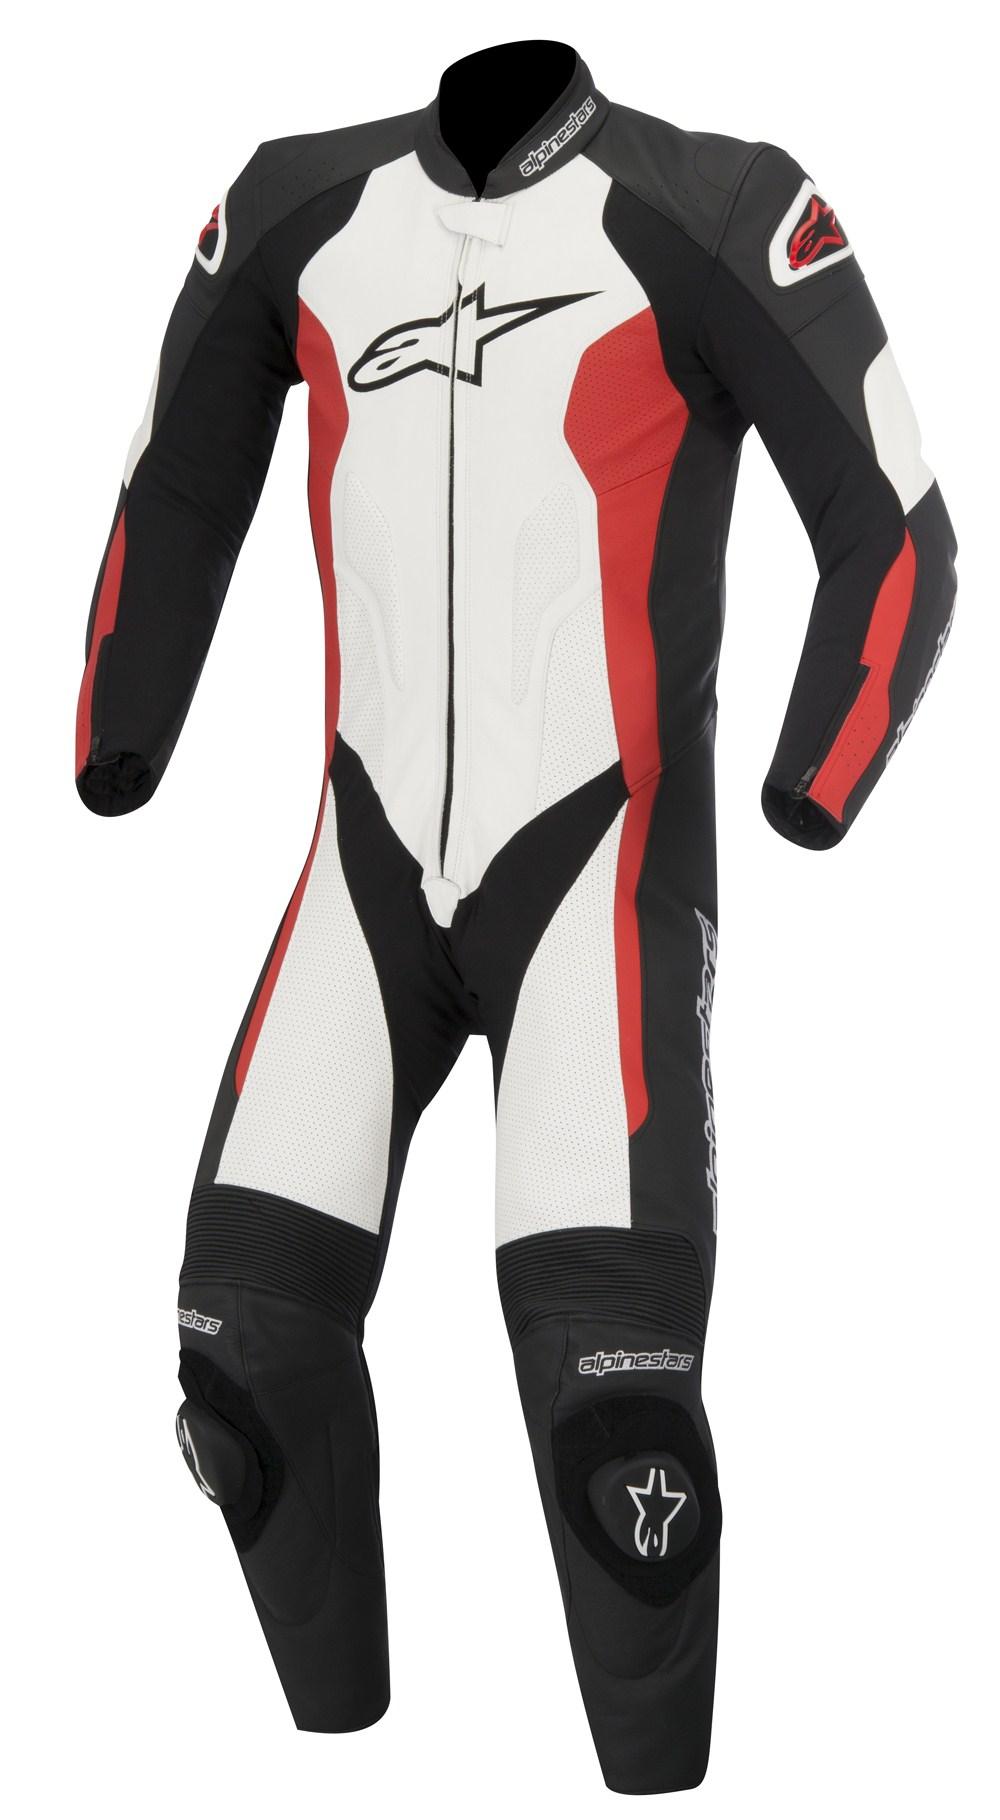 Tuta moto pelle estiva Alpinestars Challenger Nero Bianco Rosso